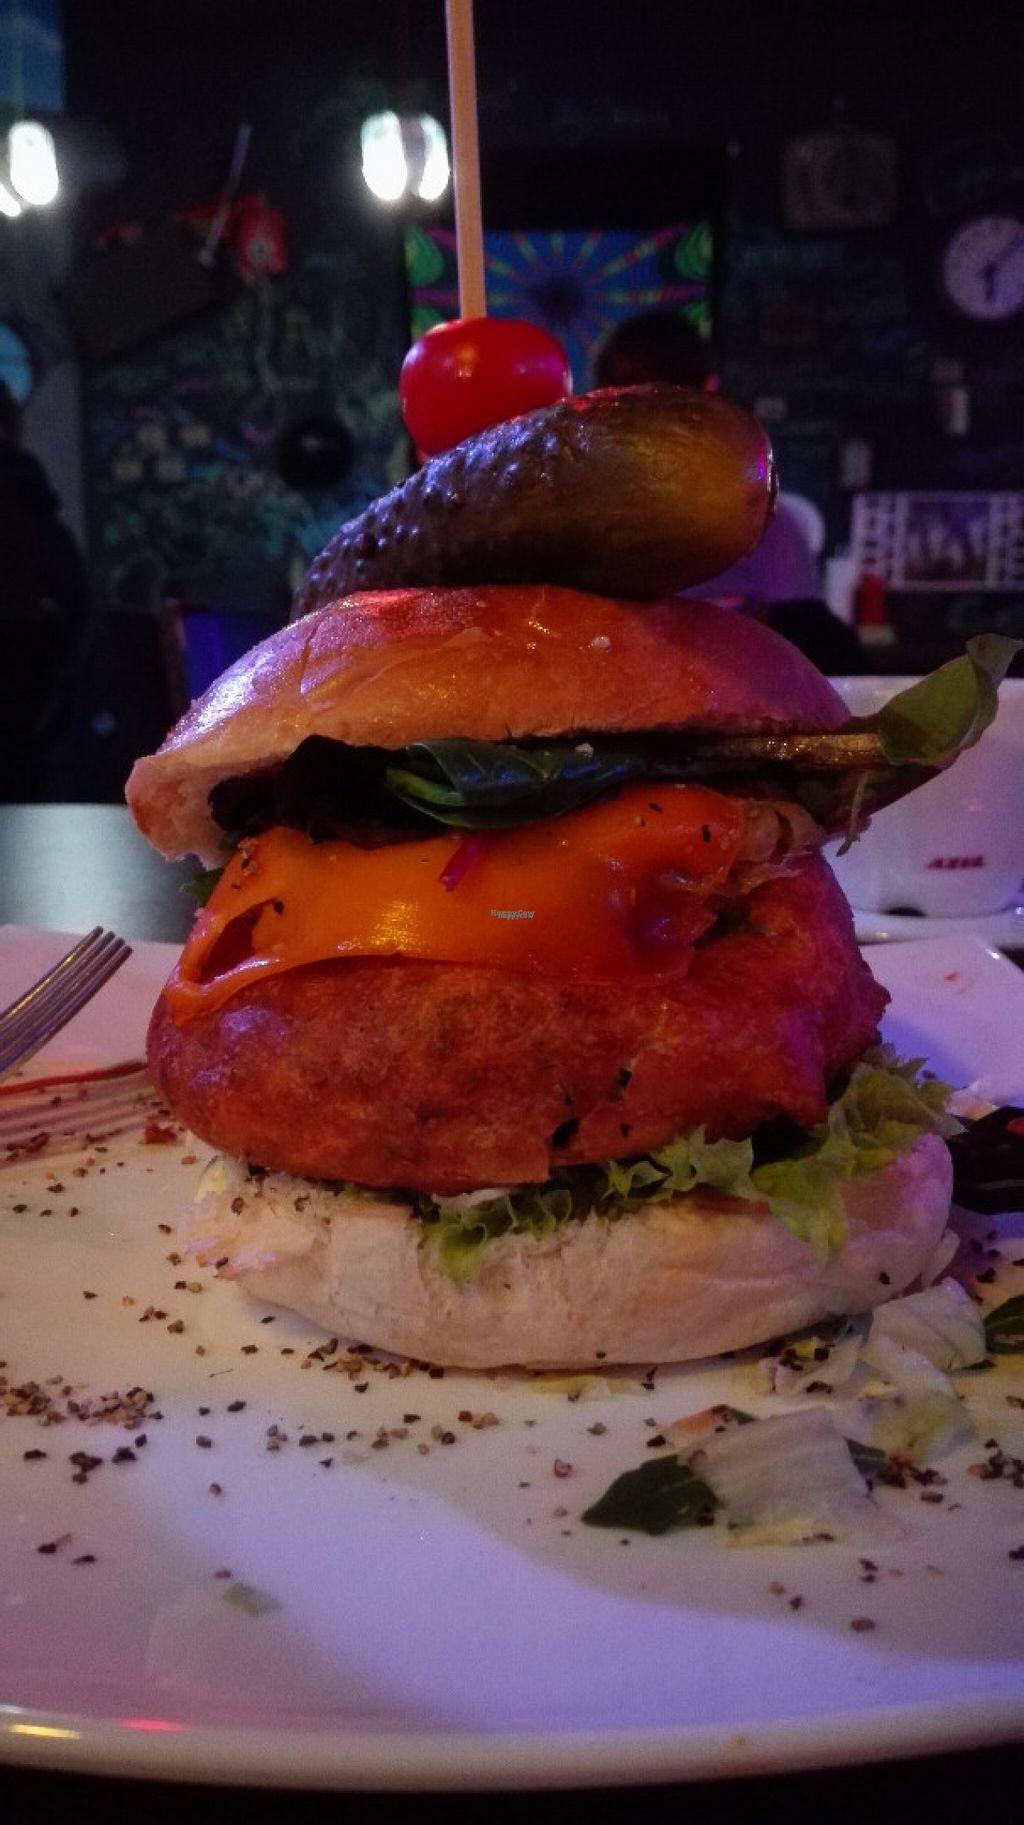 "Photo of Lily Burger  by <a href=""/members/profile/VeganVenturer"">VeganVenturer</a> <br/>The FBI New York burger in Nov 2016 <br/> November 6, 2016  - <a href='/contact/abuse/image/45852/186862'>Report</a>"